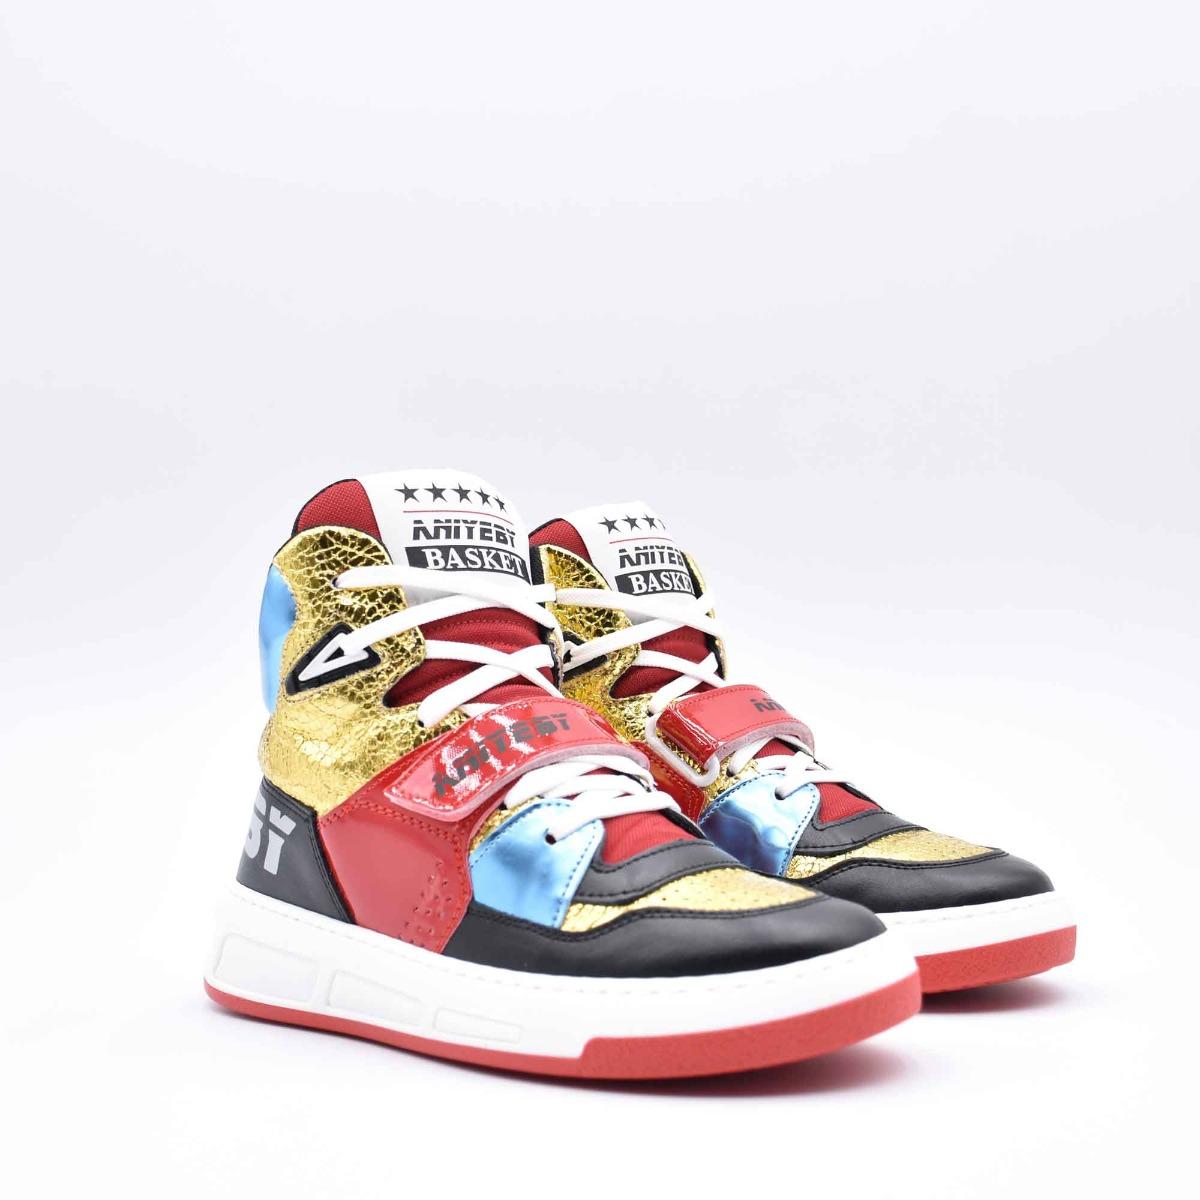 Aniye basket las vegas - Multicolore